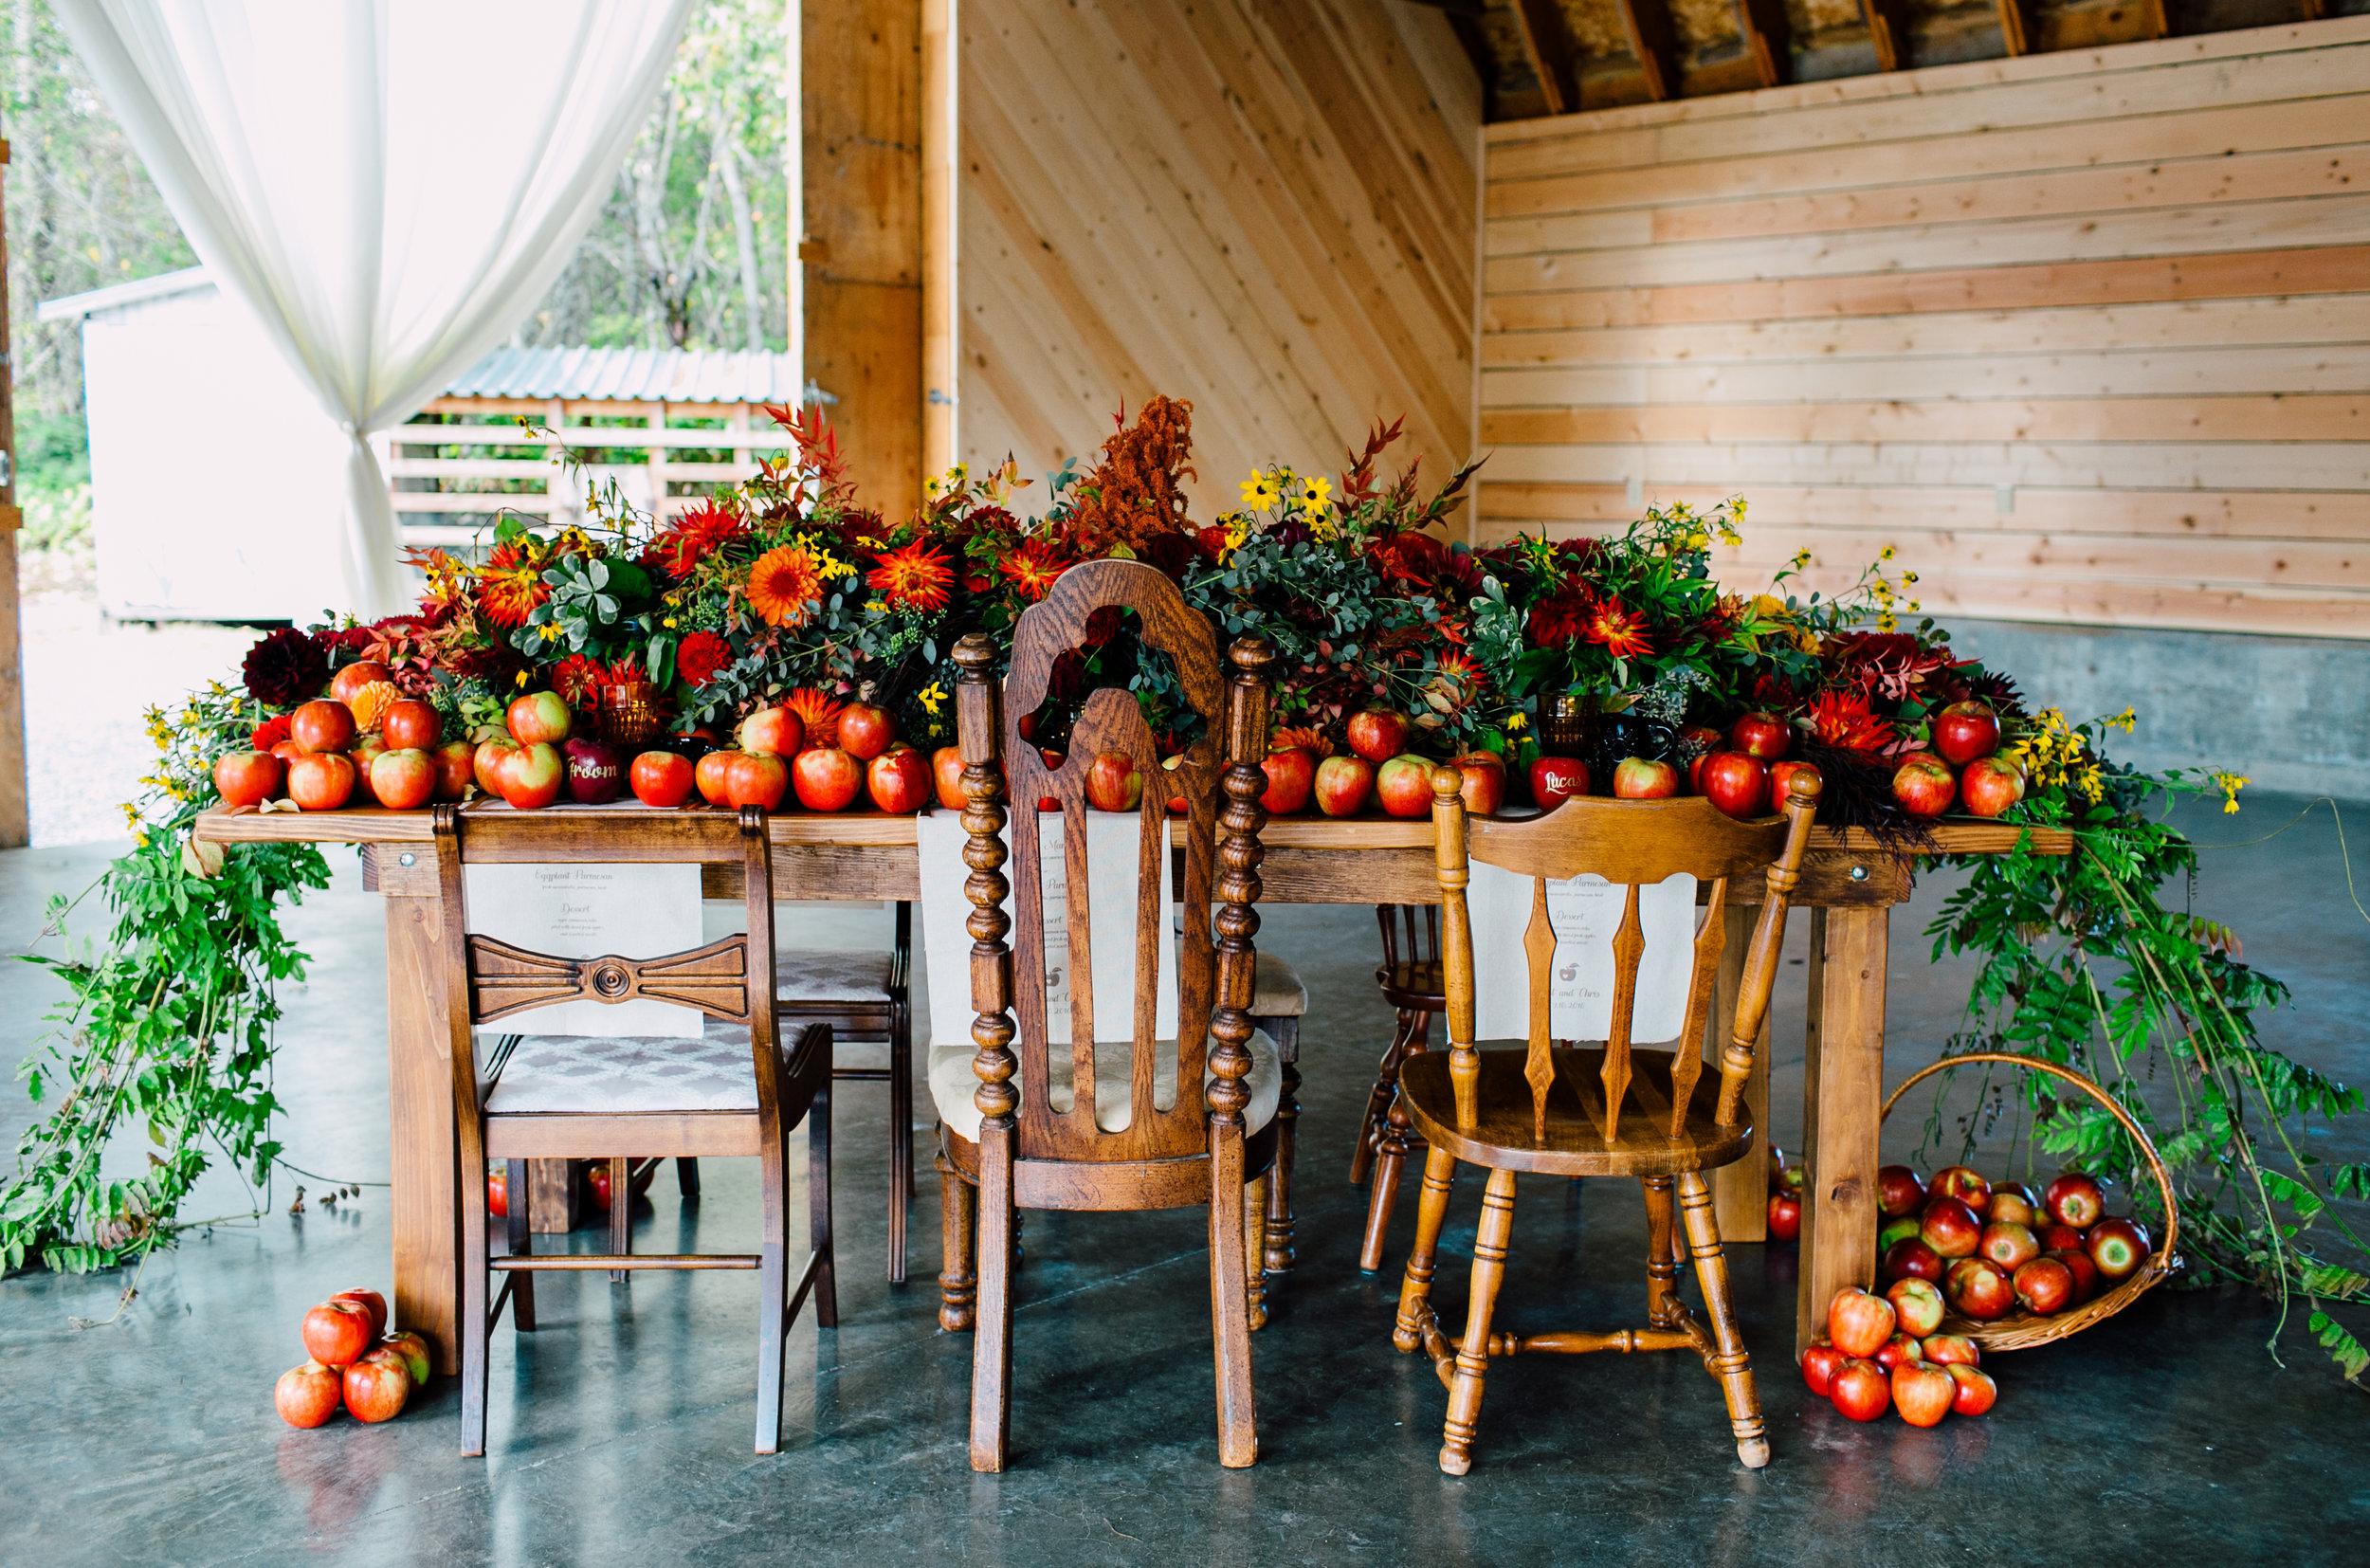 apple-styled-session-bellingham-washington-katheryn-moran-photography-19.jpg